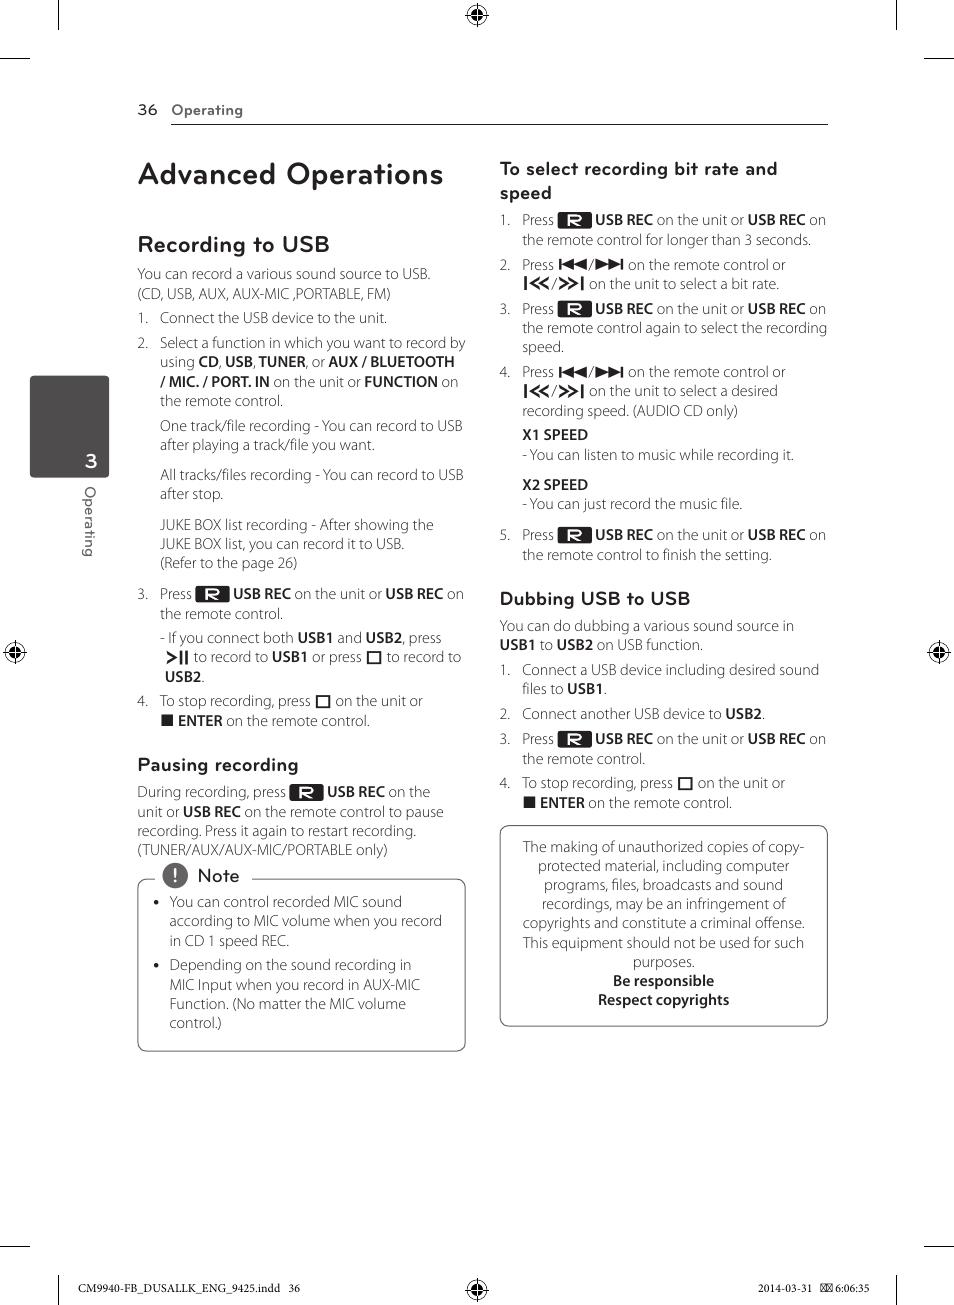 advanced operations recording to usb lg cm9940 user manual page rh manualsdir com LG Flip Phone Manual LG Touch Phone Operating Manual